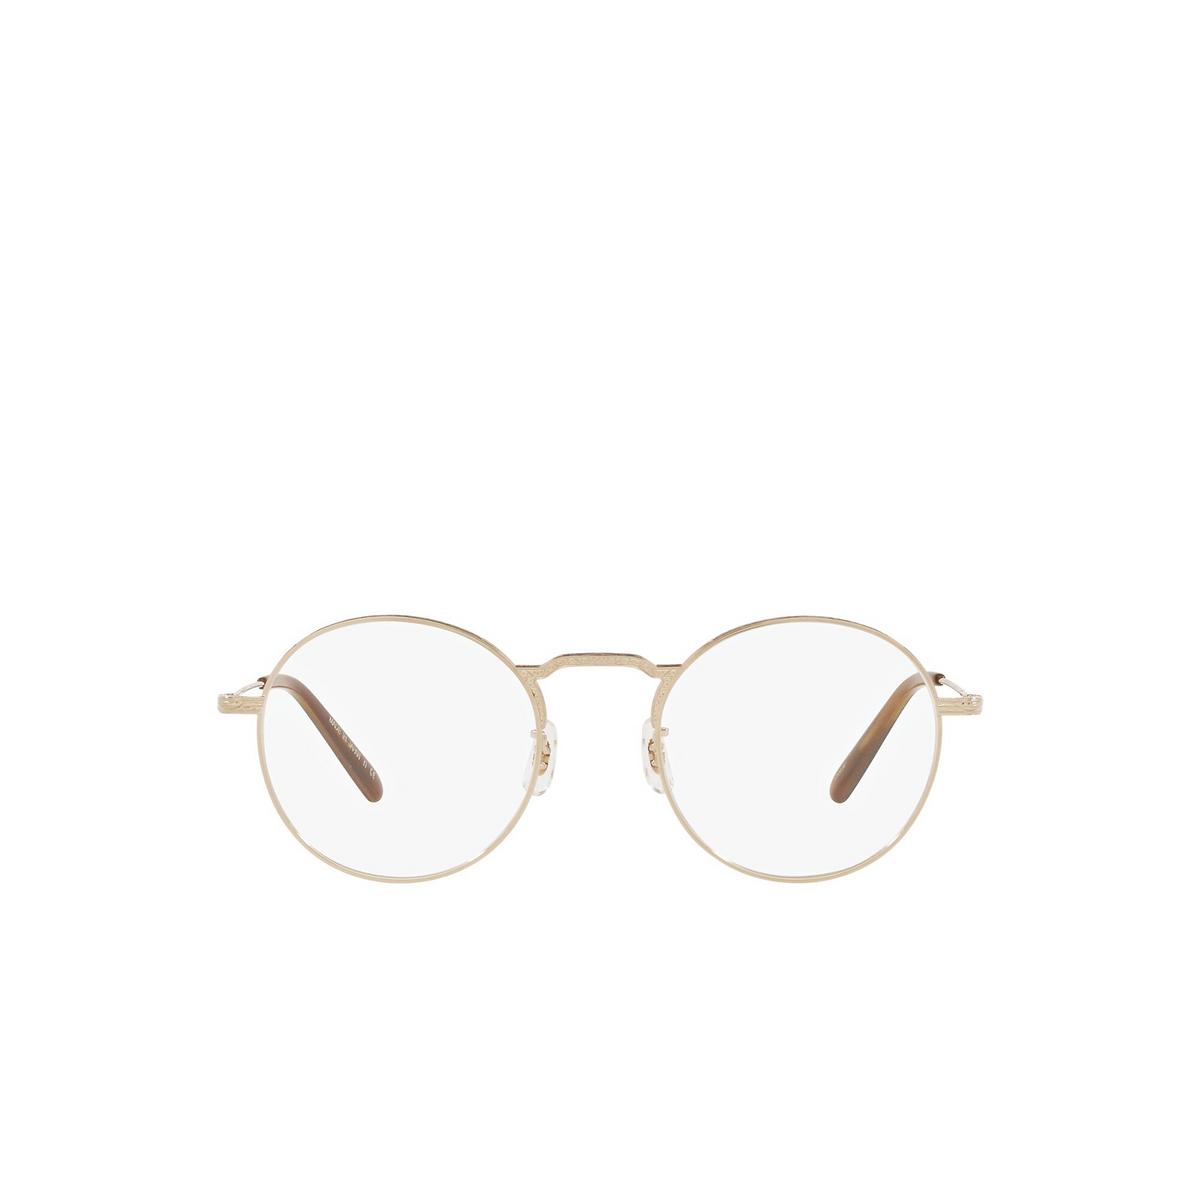 Oliver Peoples® Round Eyeglasses: Weslie OV1282T color White Gold 5292 - front view.